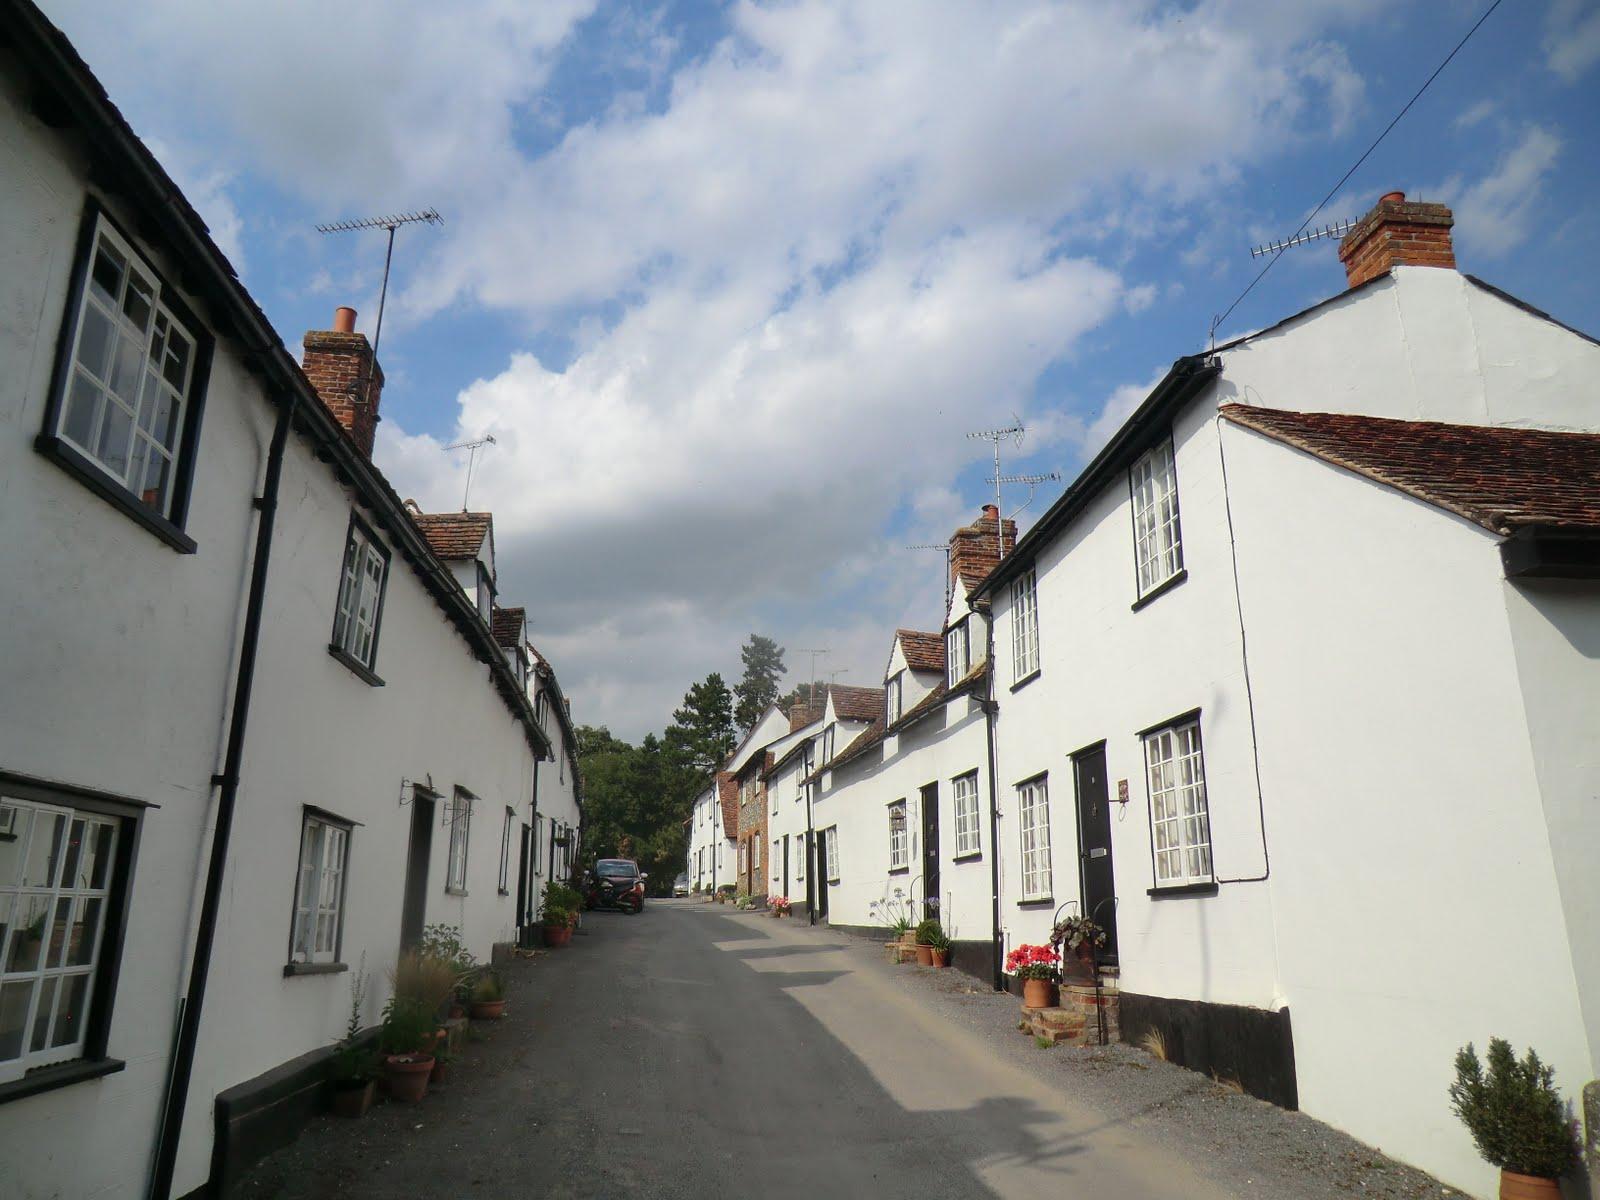 CIMG6047 Audley End village